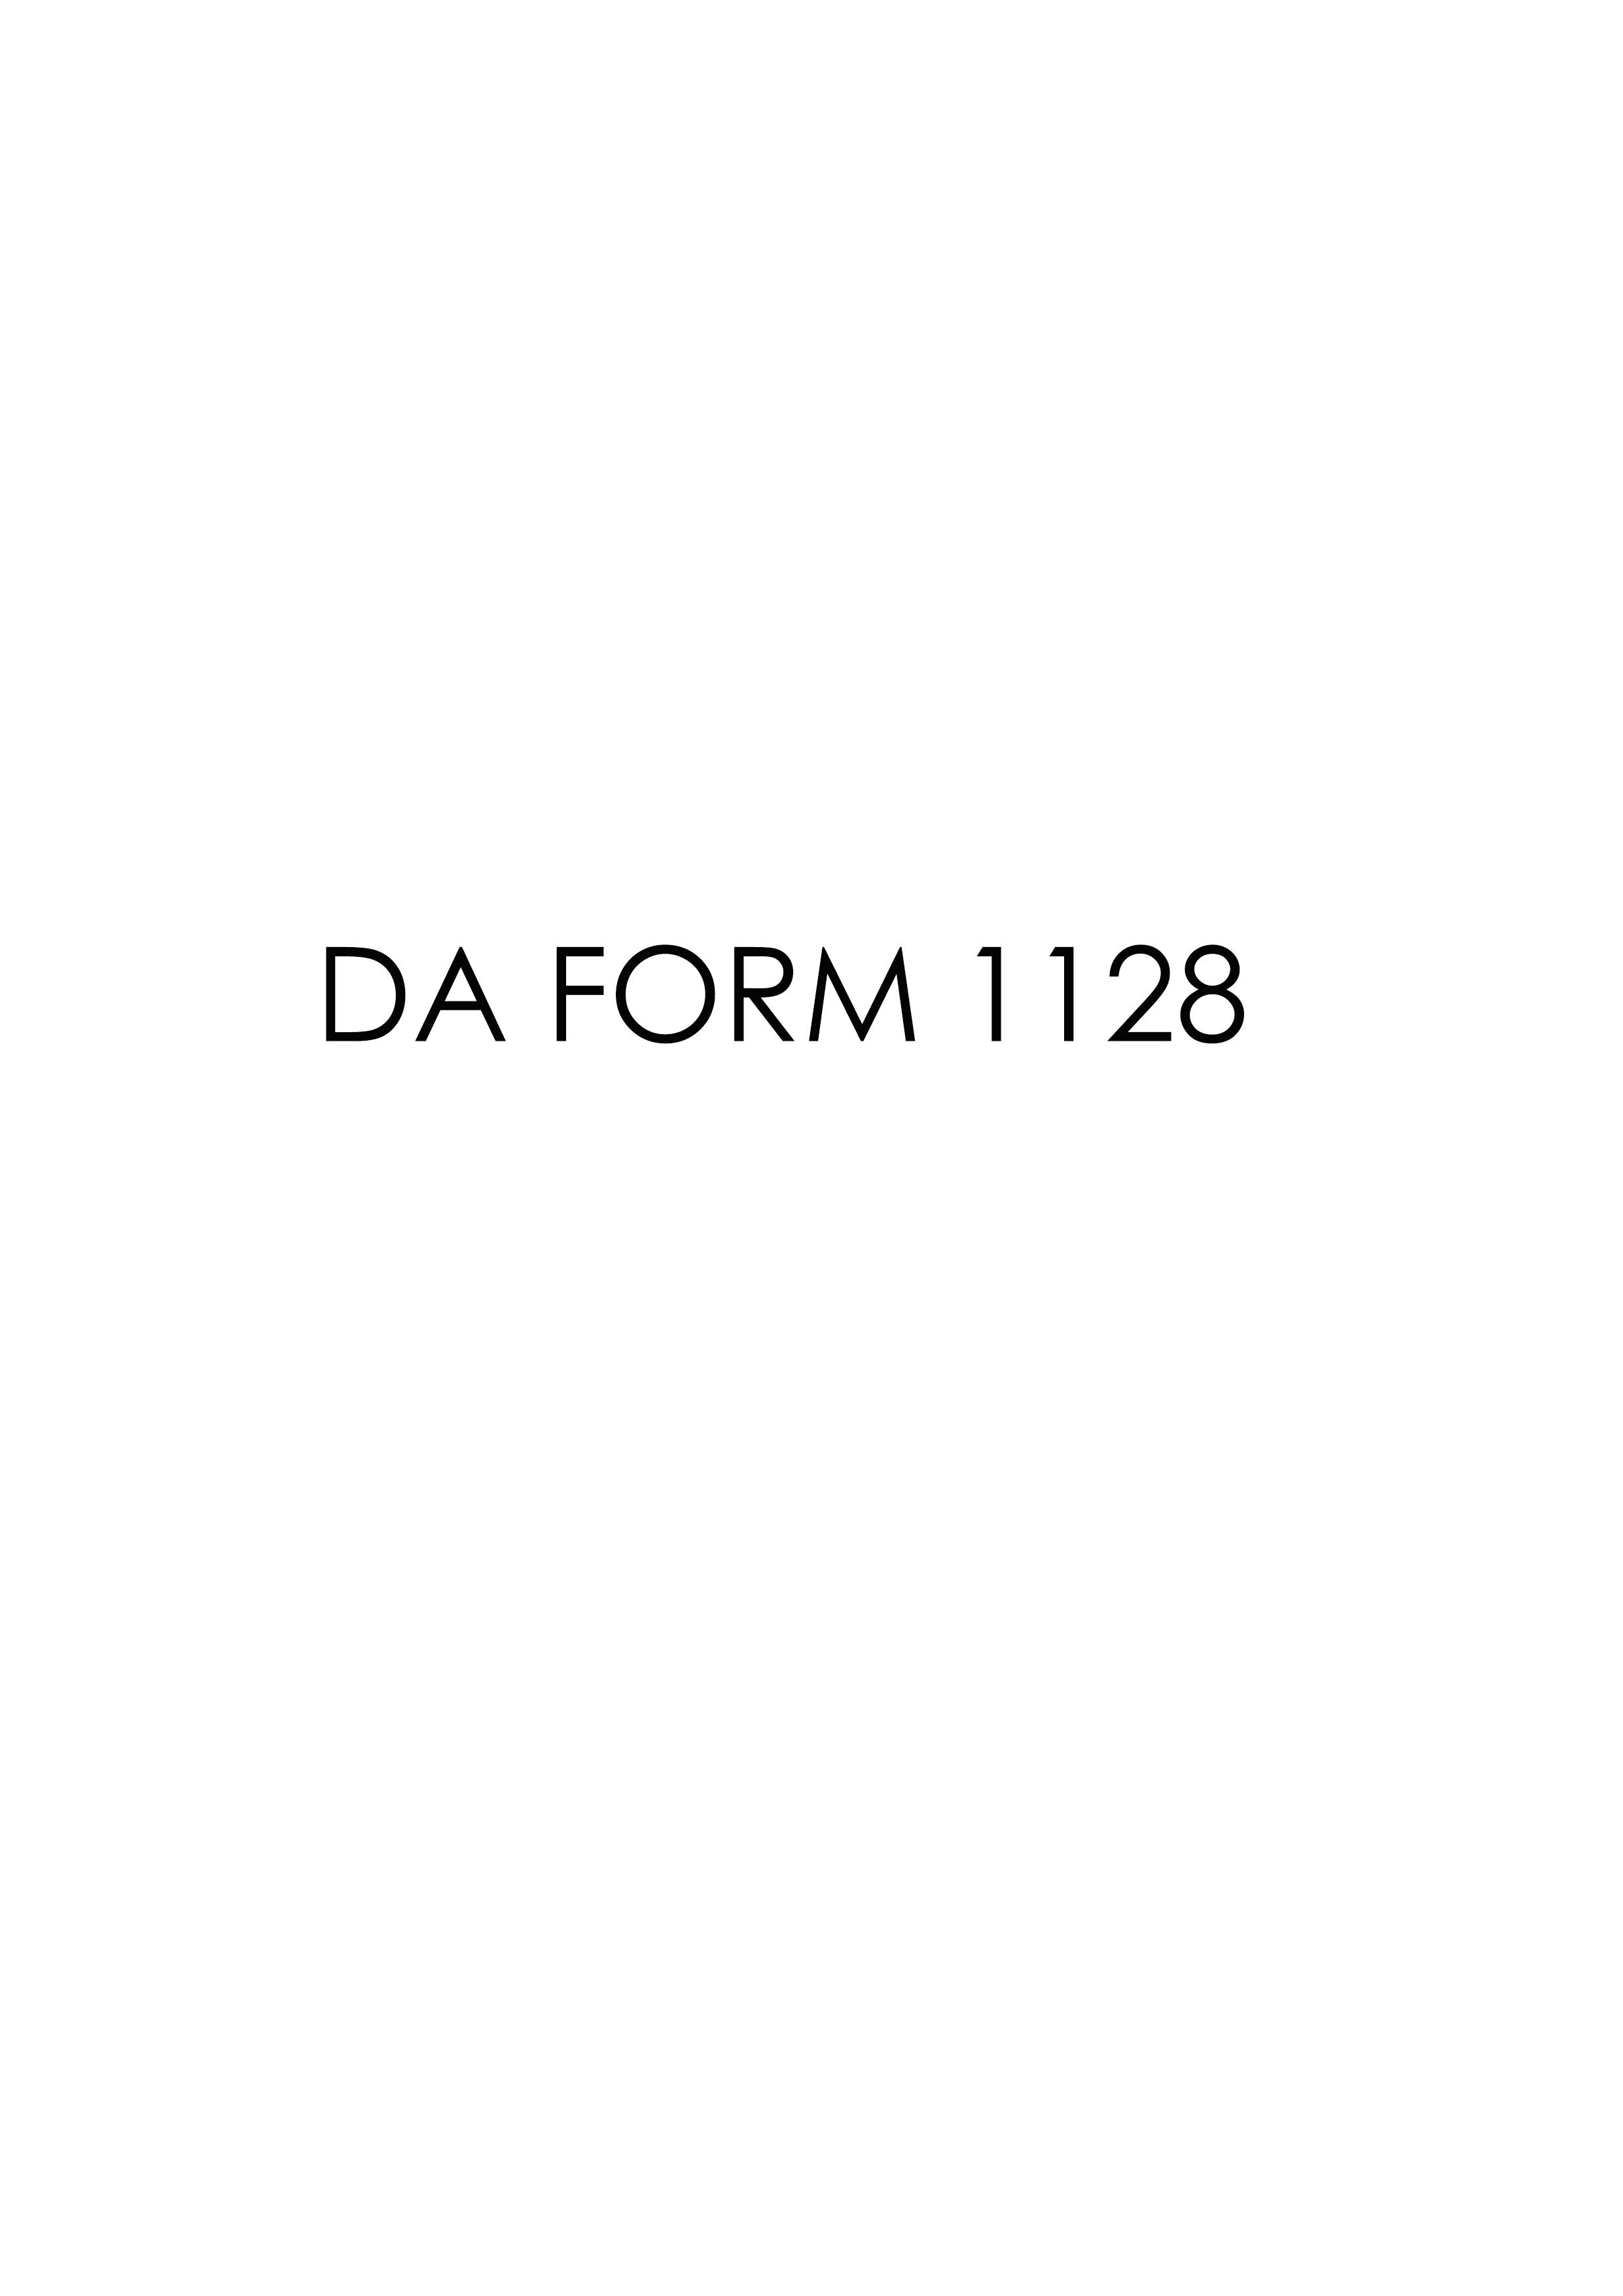 Download Fillable da Form 1128